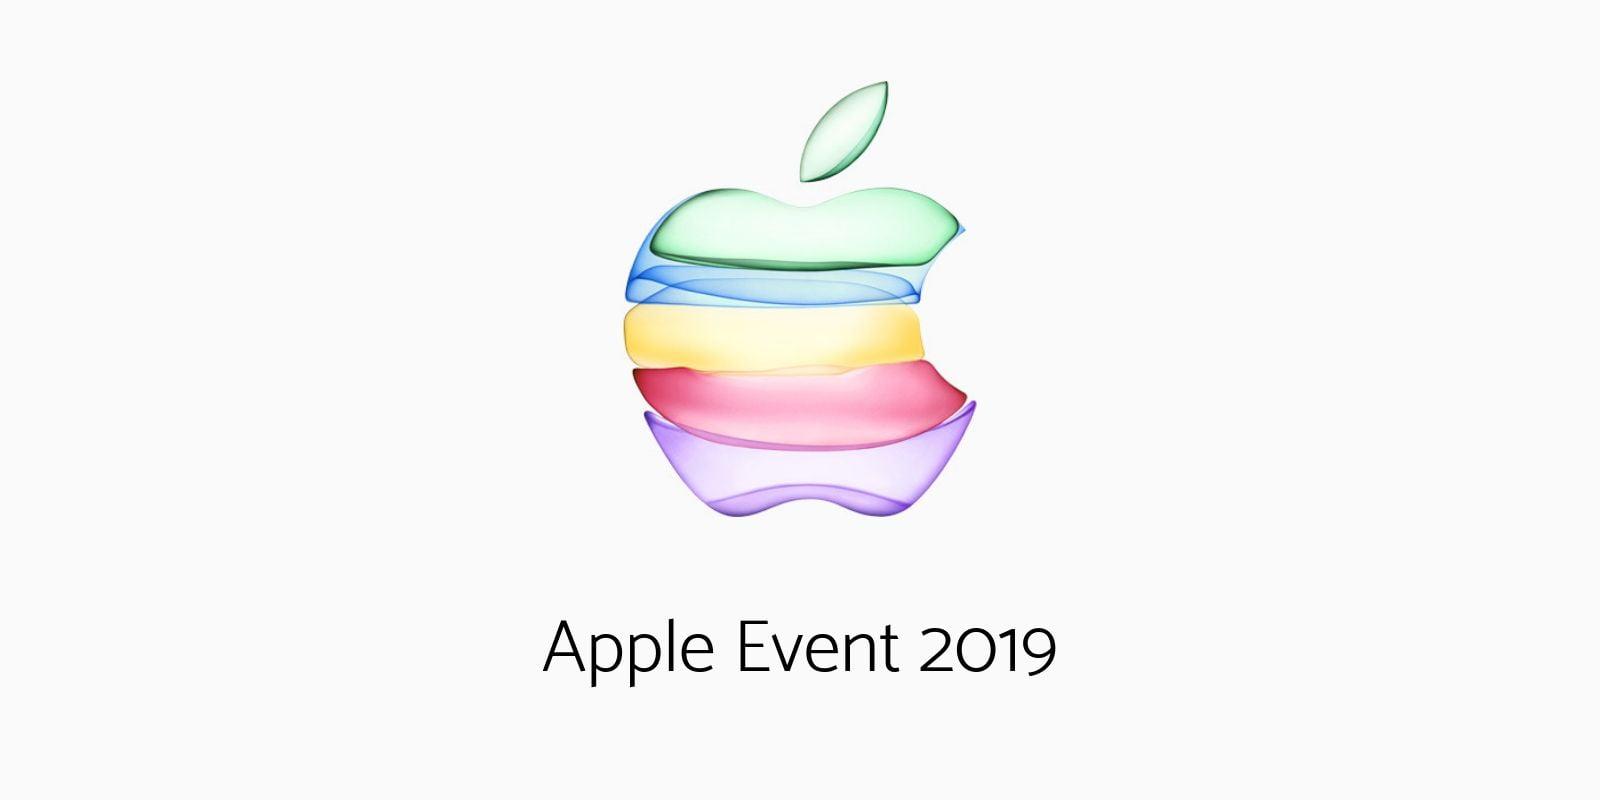 Watch Apple iPhone 11 event